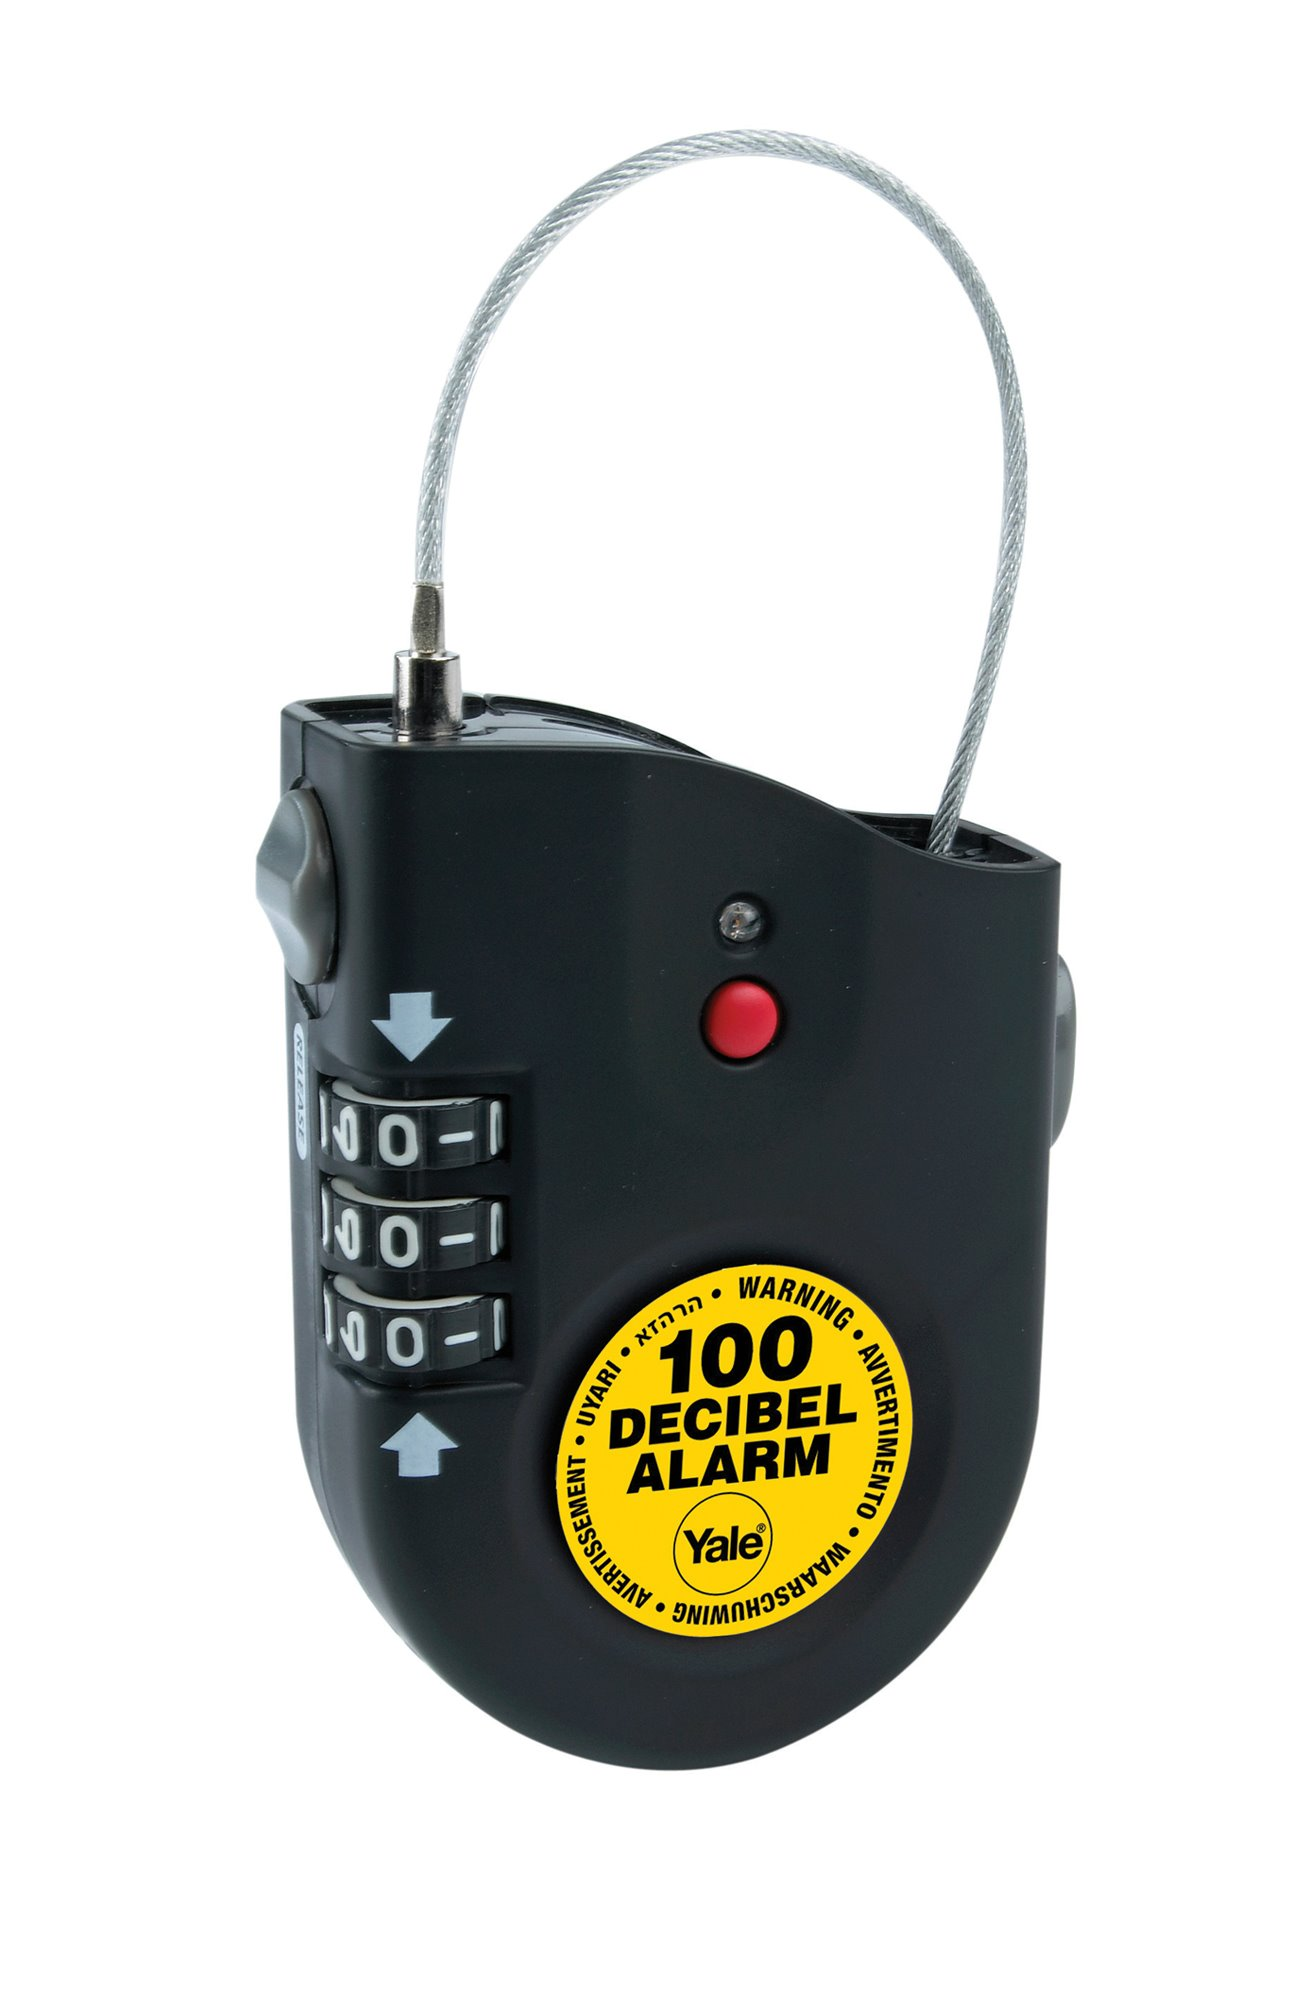 Ycl1 2 Alarm Lock Alarm Mini Bike Locks Yale Lock